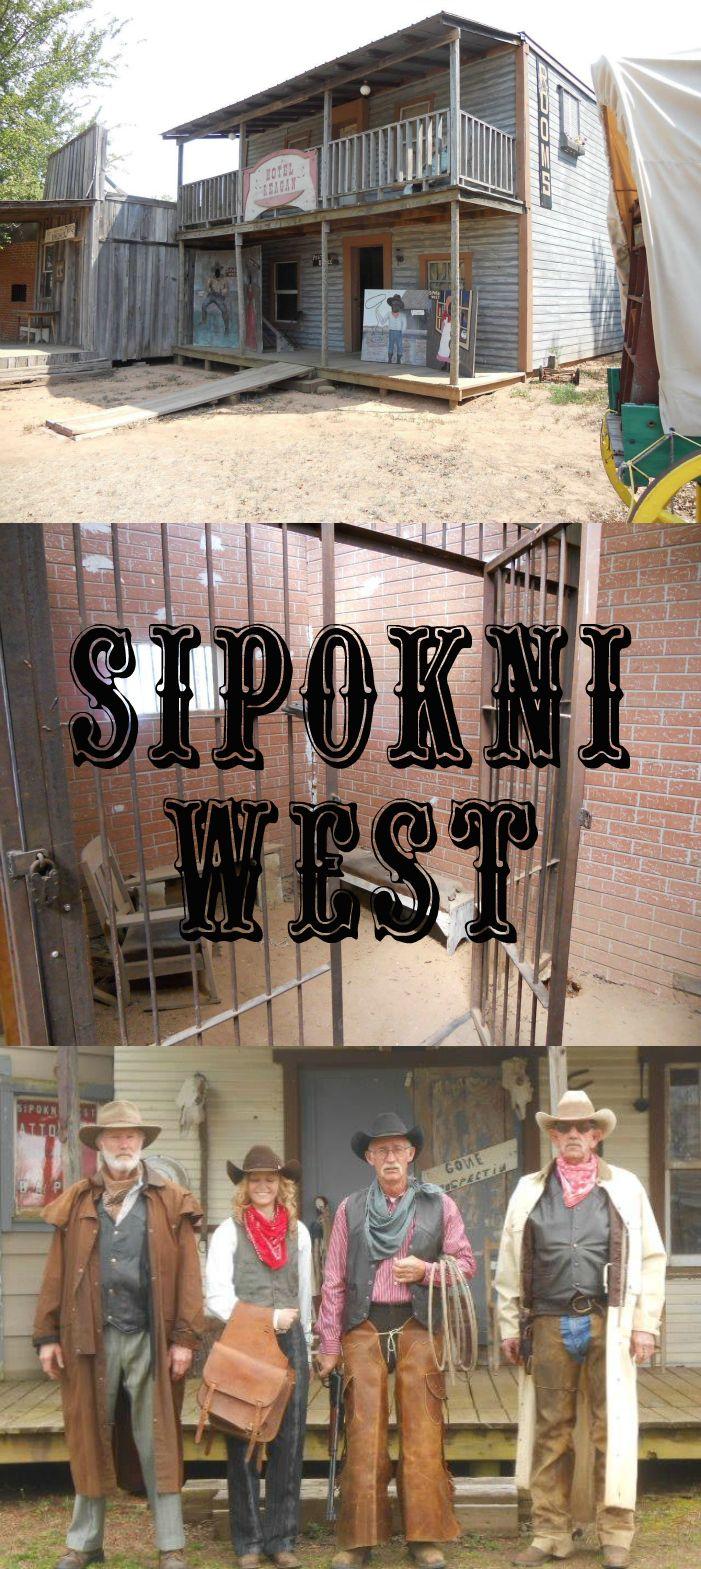 Head to Sipokni West in Tishomingo, Oklahoma to experience